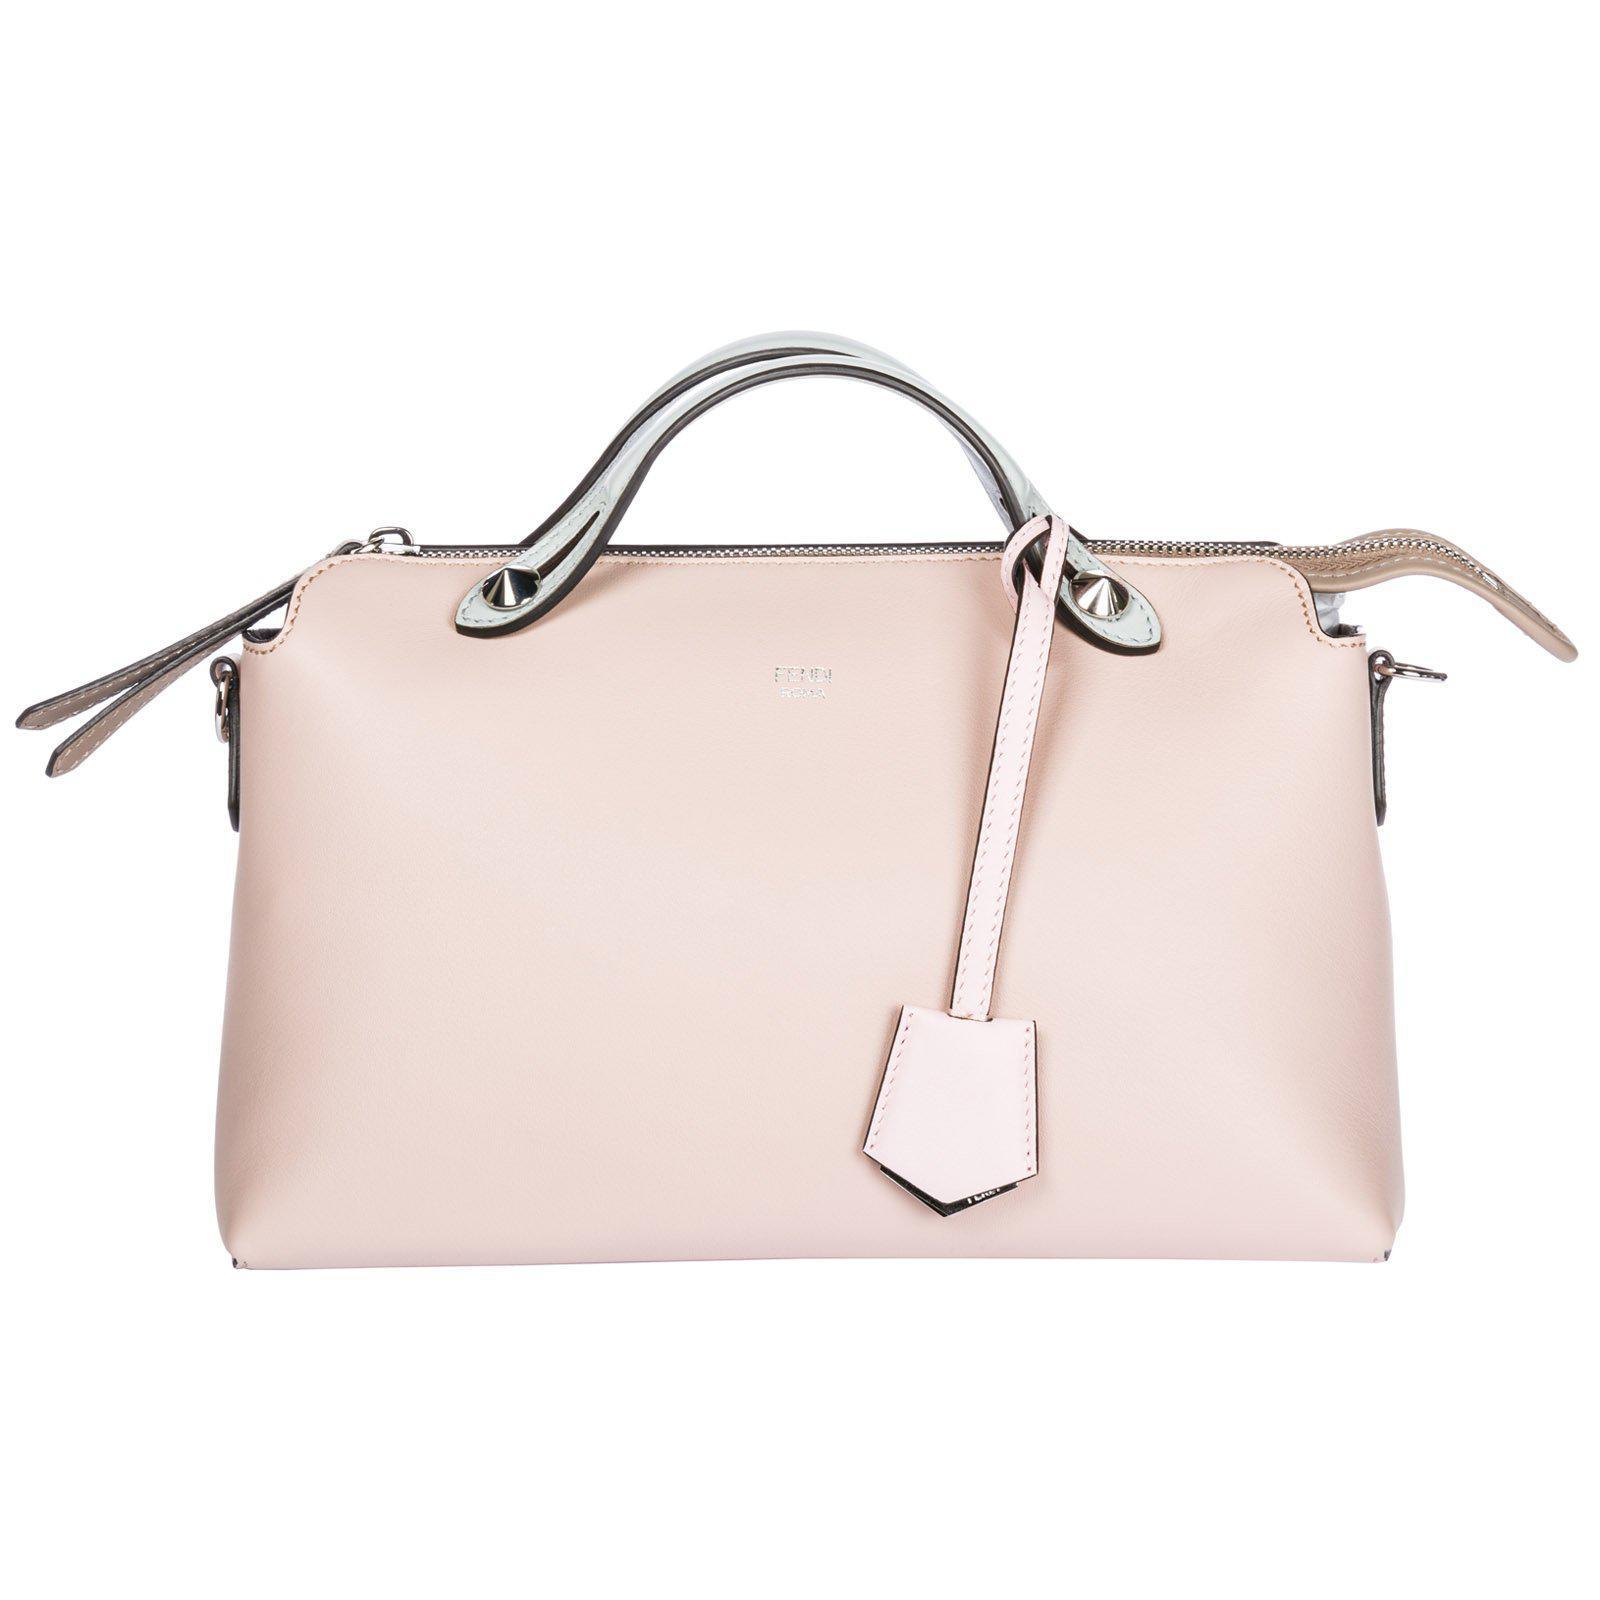 Lyst - Fendi By The Way Boston Bag in Pink 20b32ea8594fe